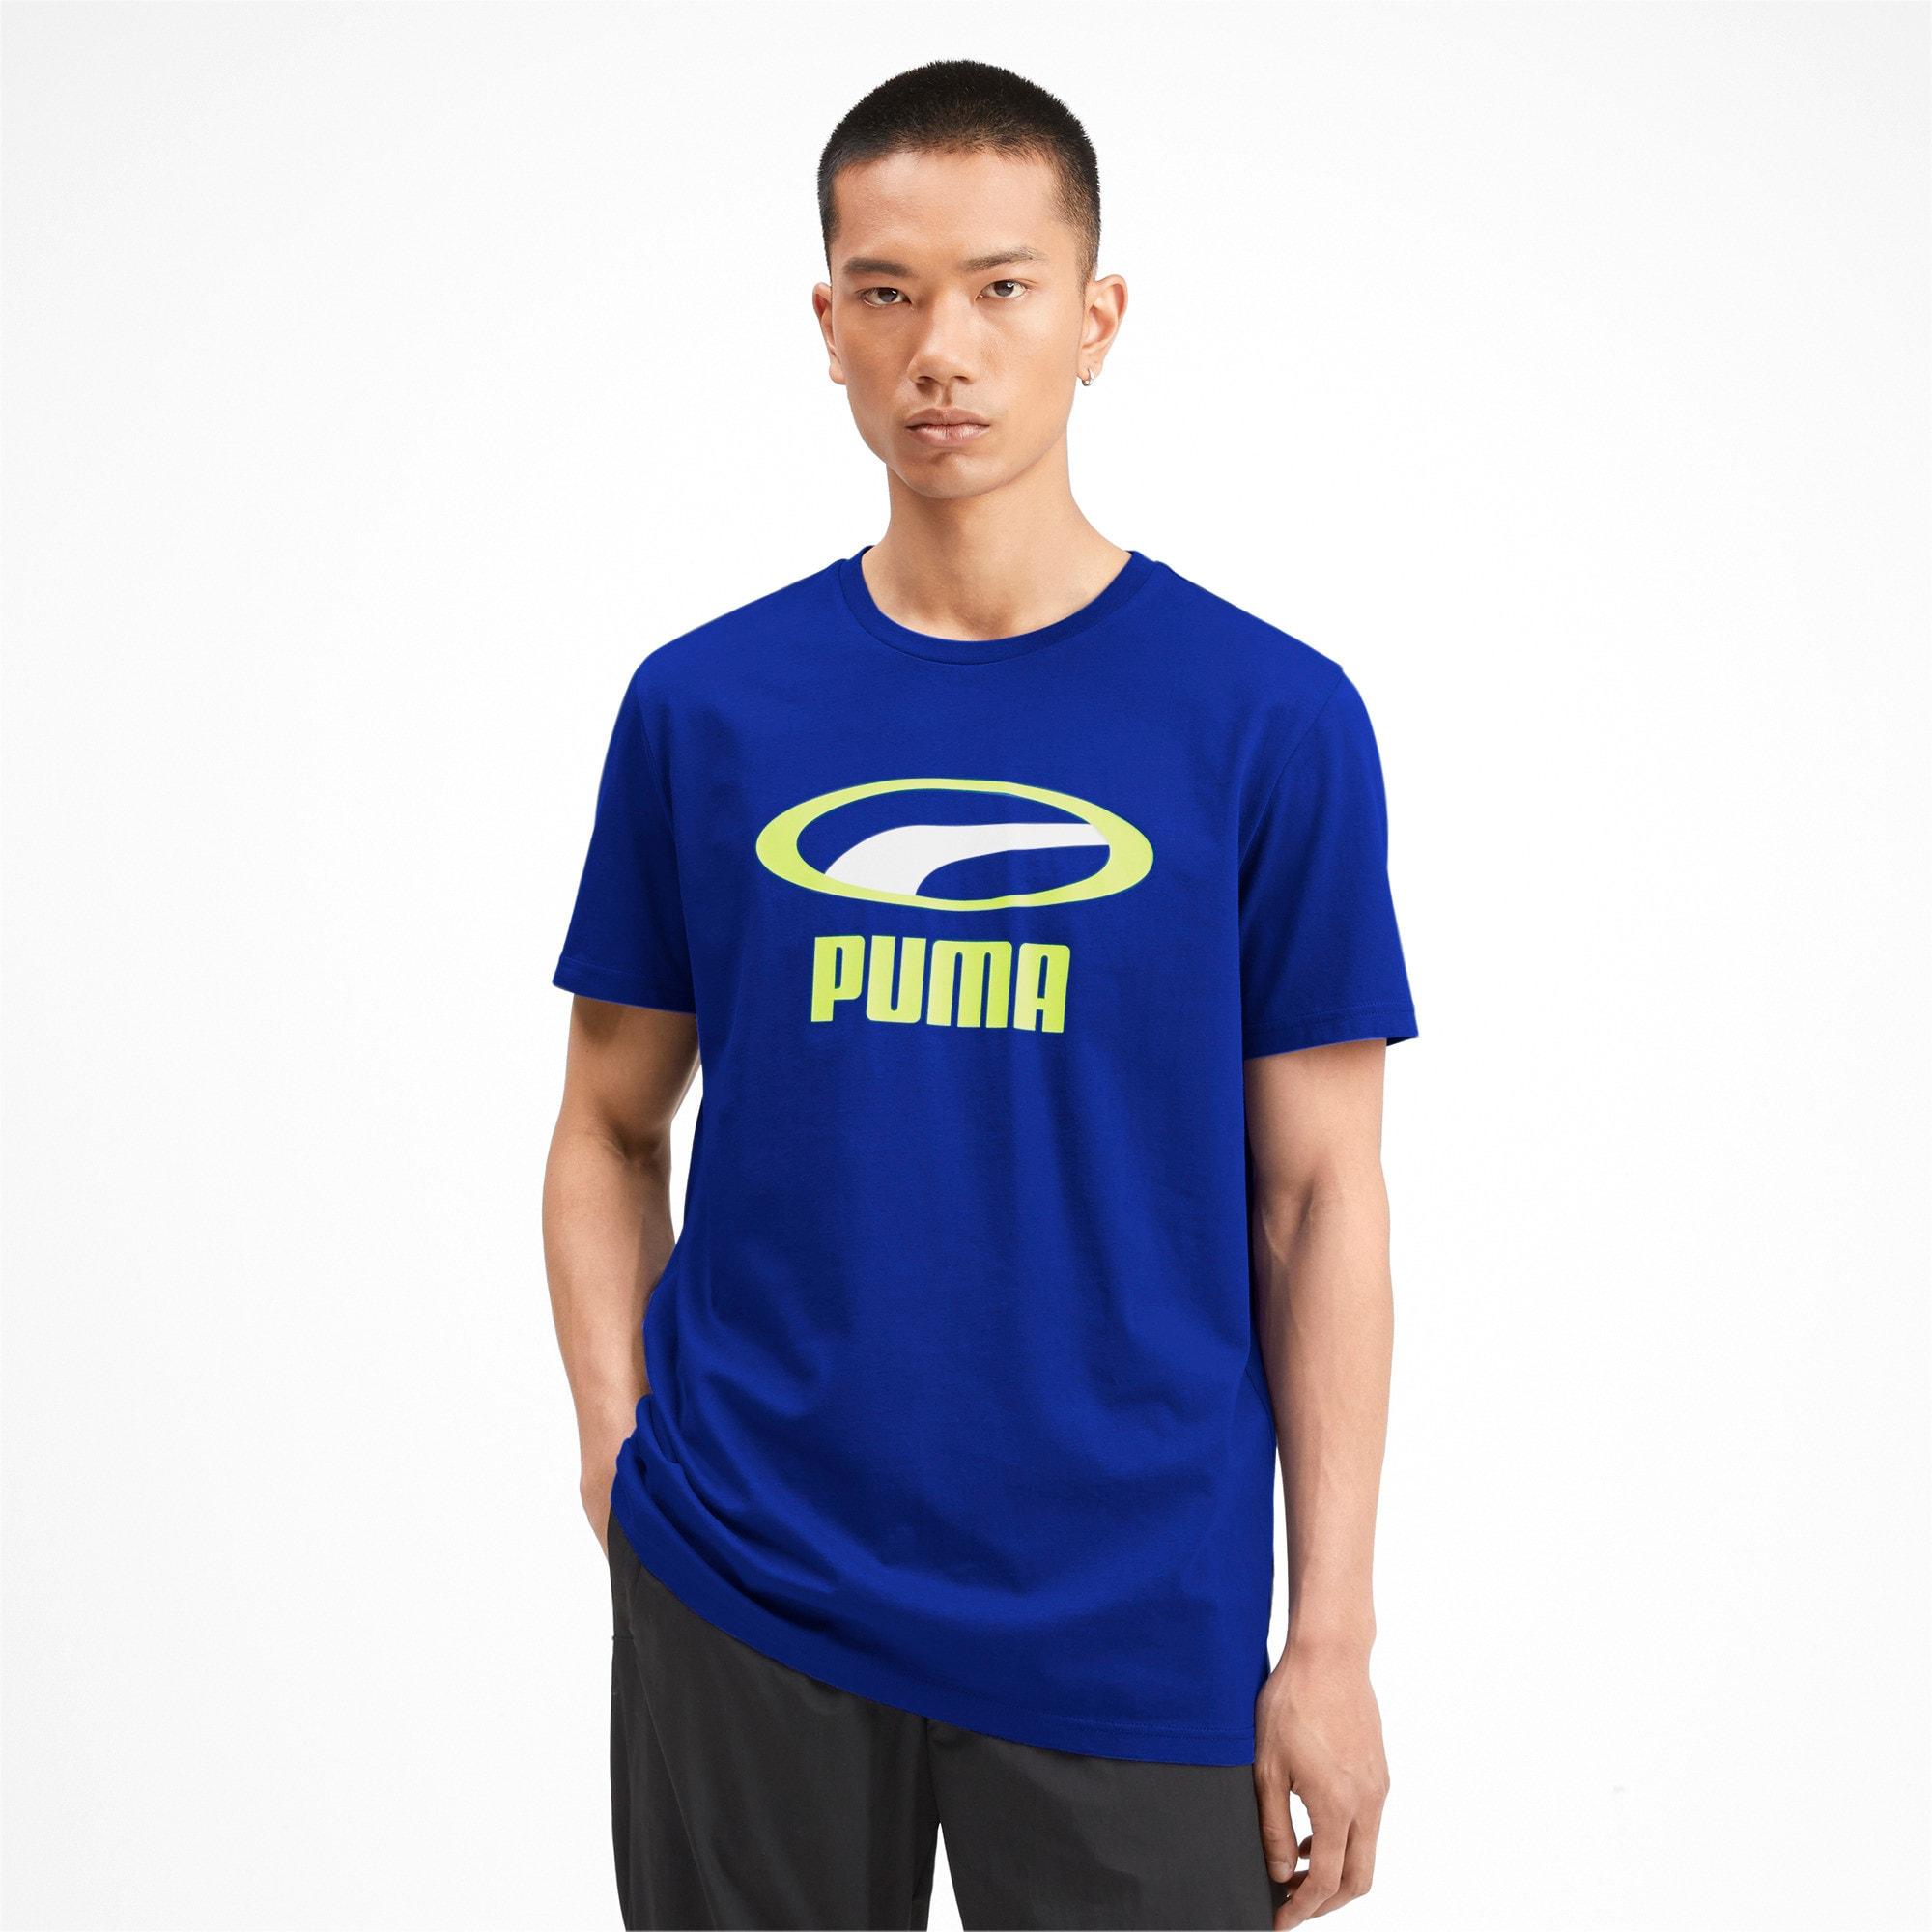 Thumbnail 2 of PUMA XTG グラフィック SS Tシャツ 半袖, Surf The Web, medium-JPN